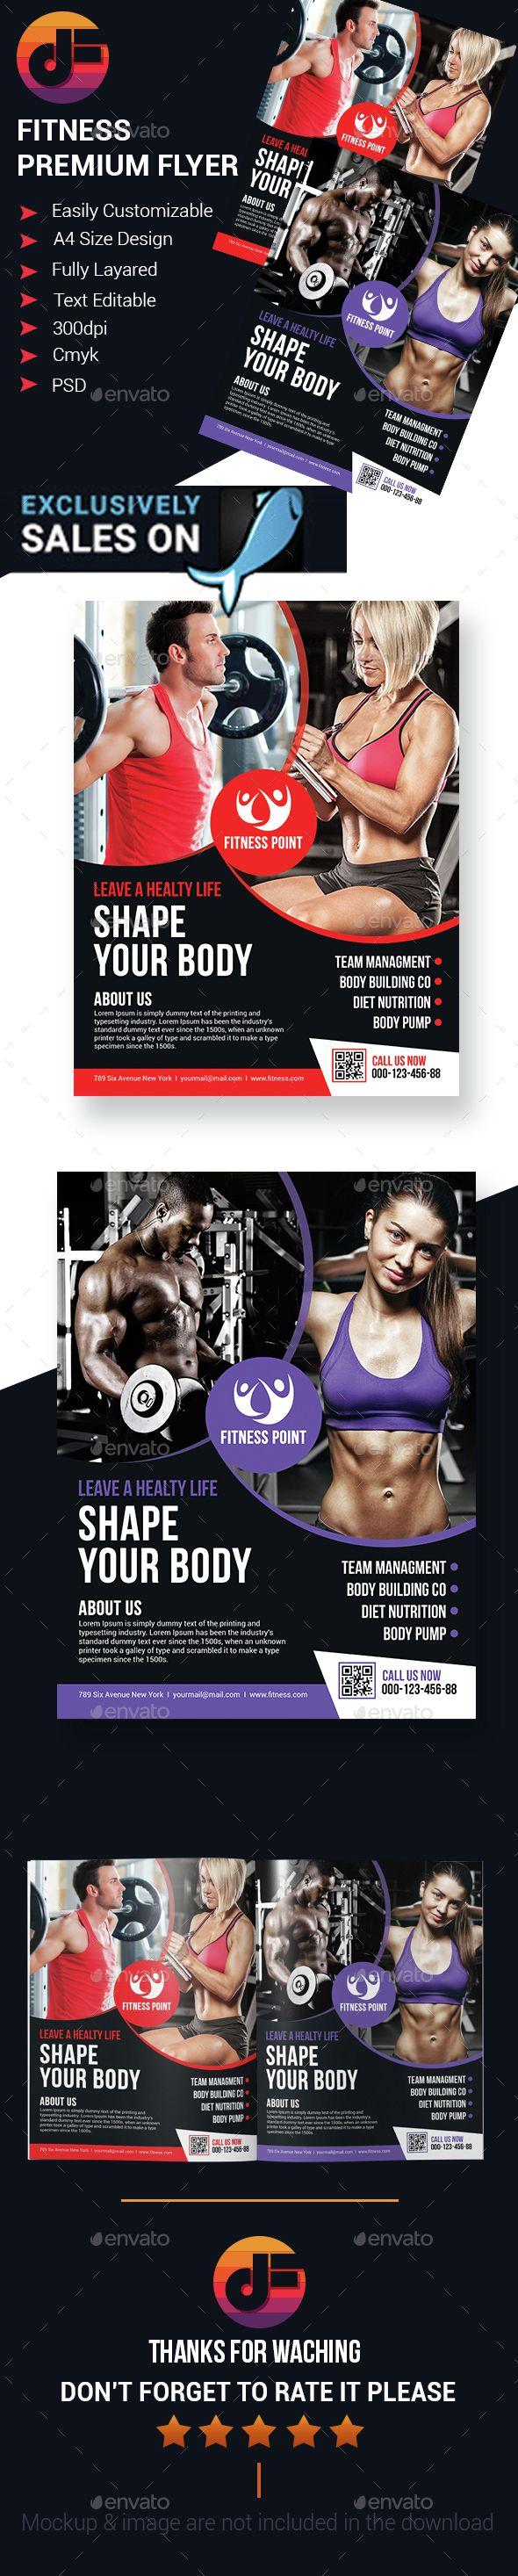 Zumba flyer design zumba flyers - Fitness Premium Flyer Design